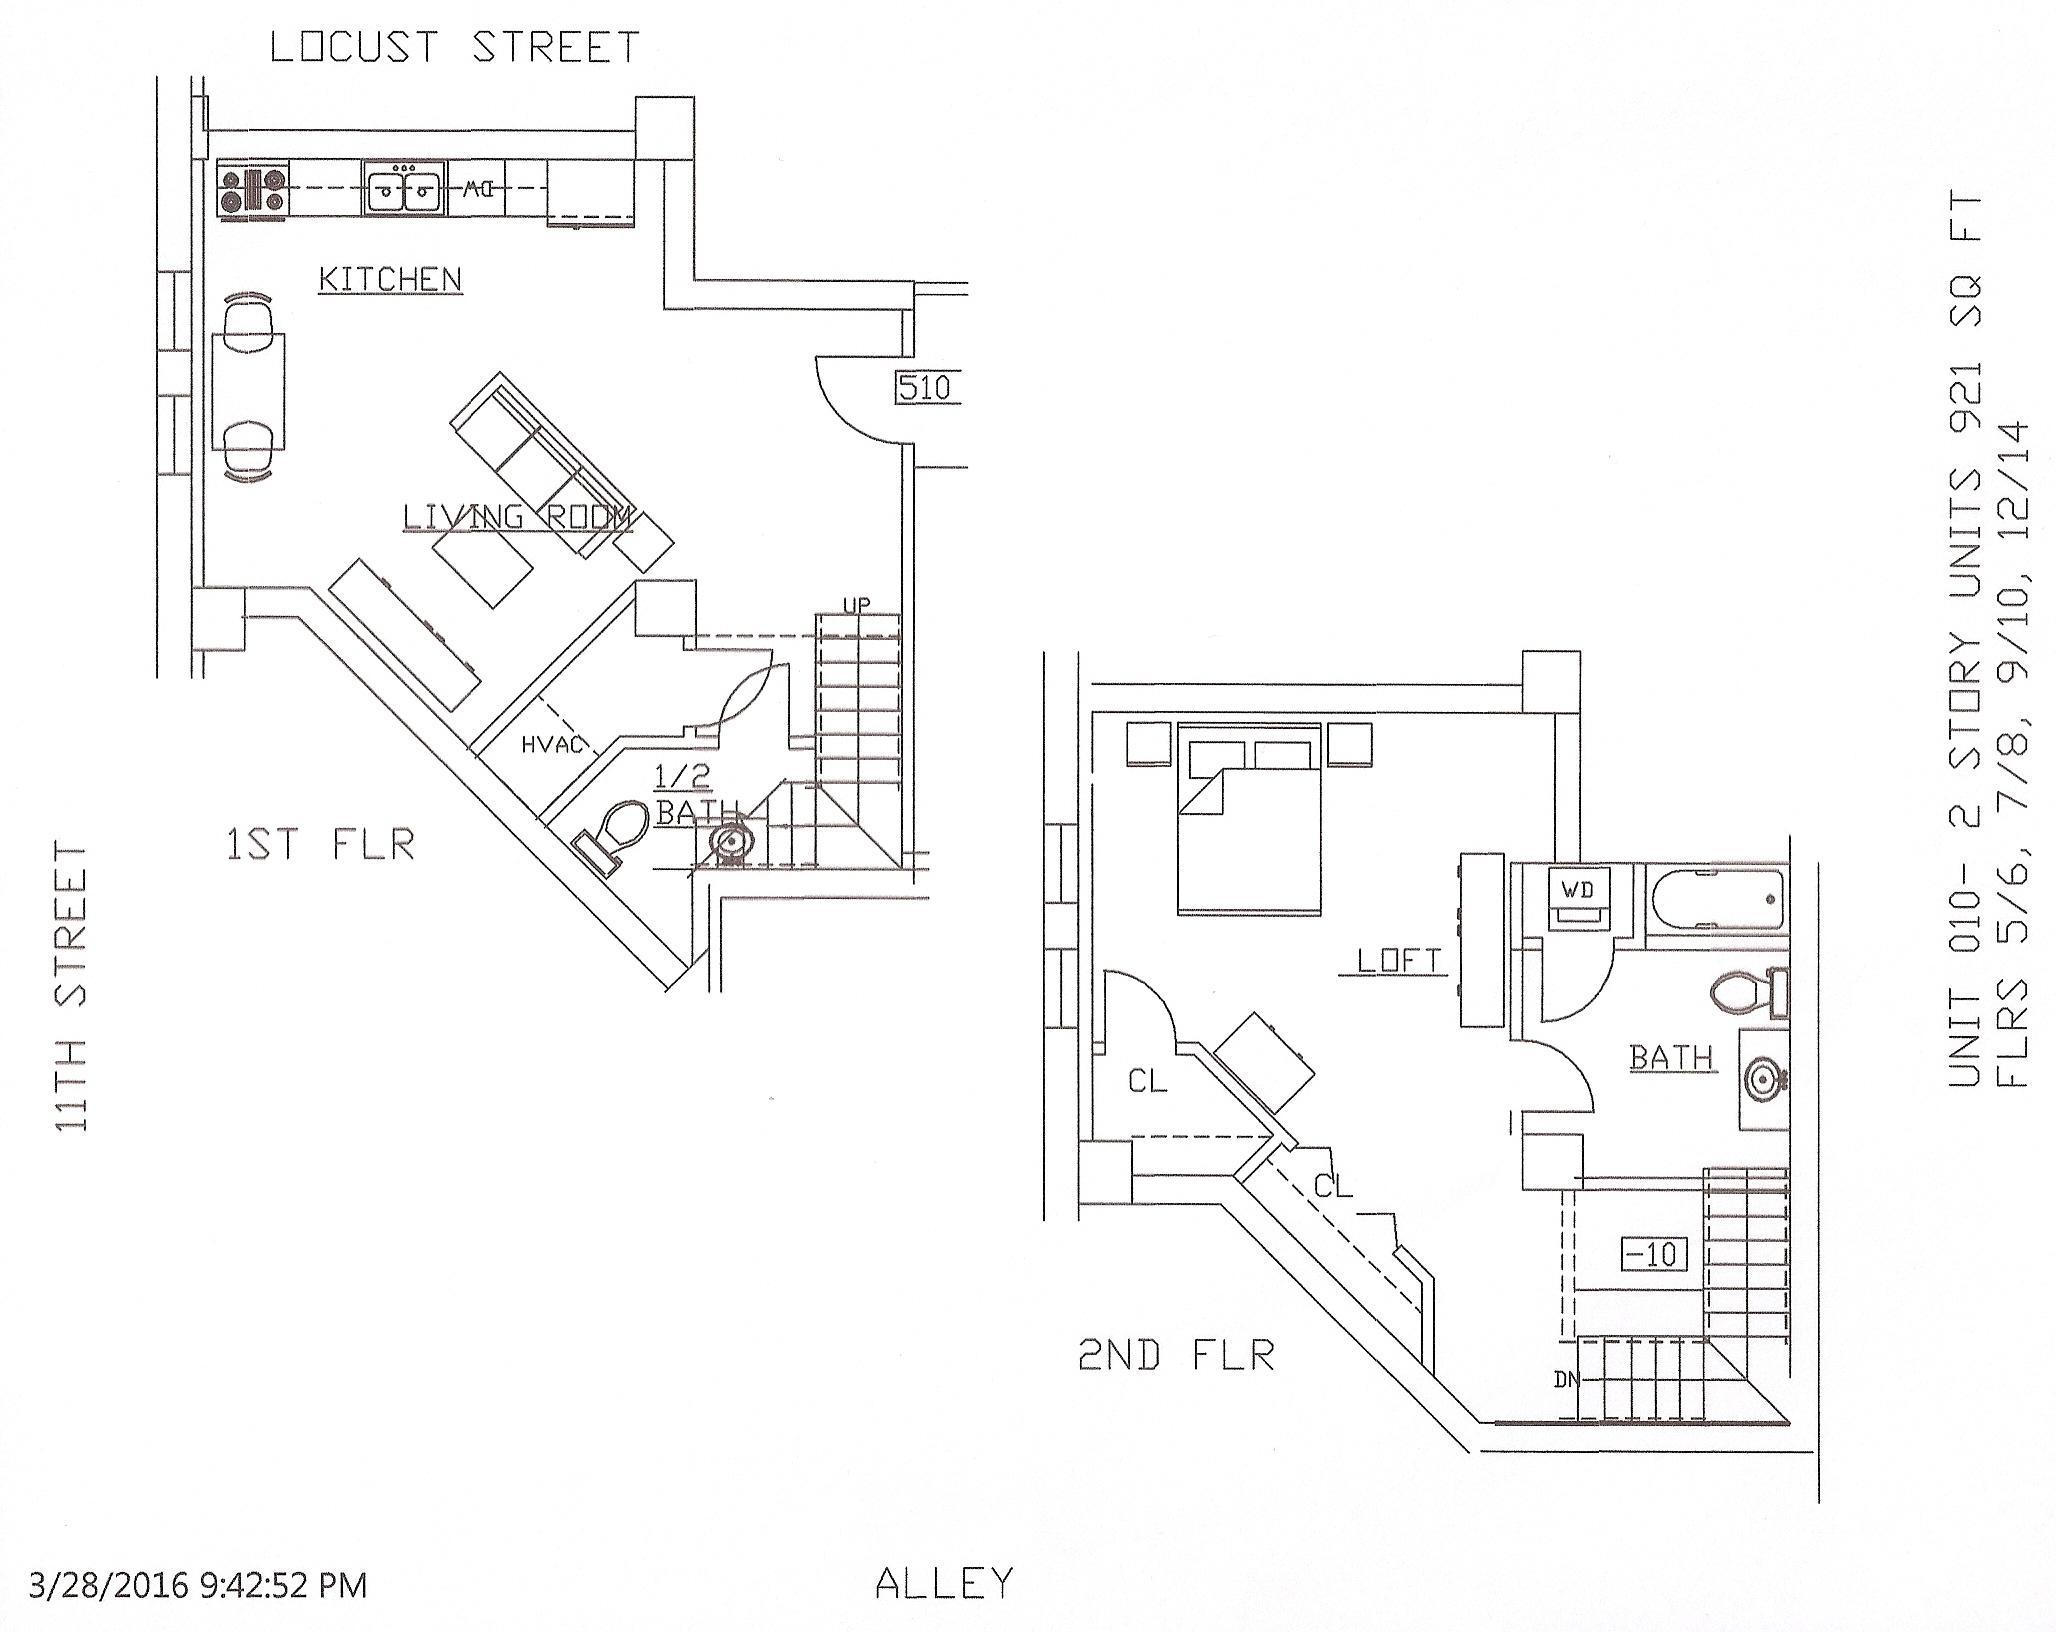 Unit 10, 921 Square Feet